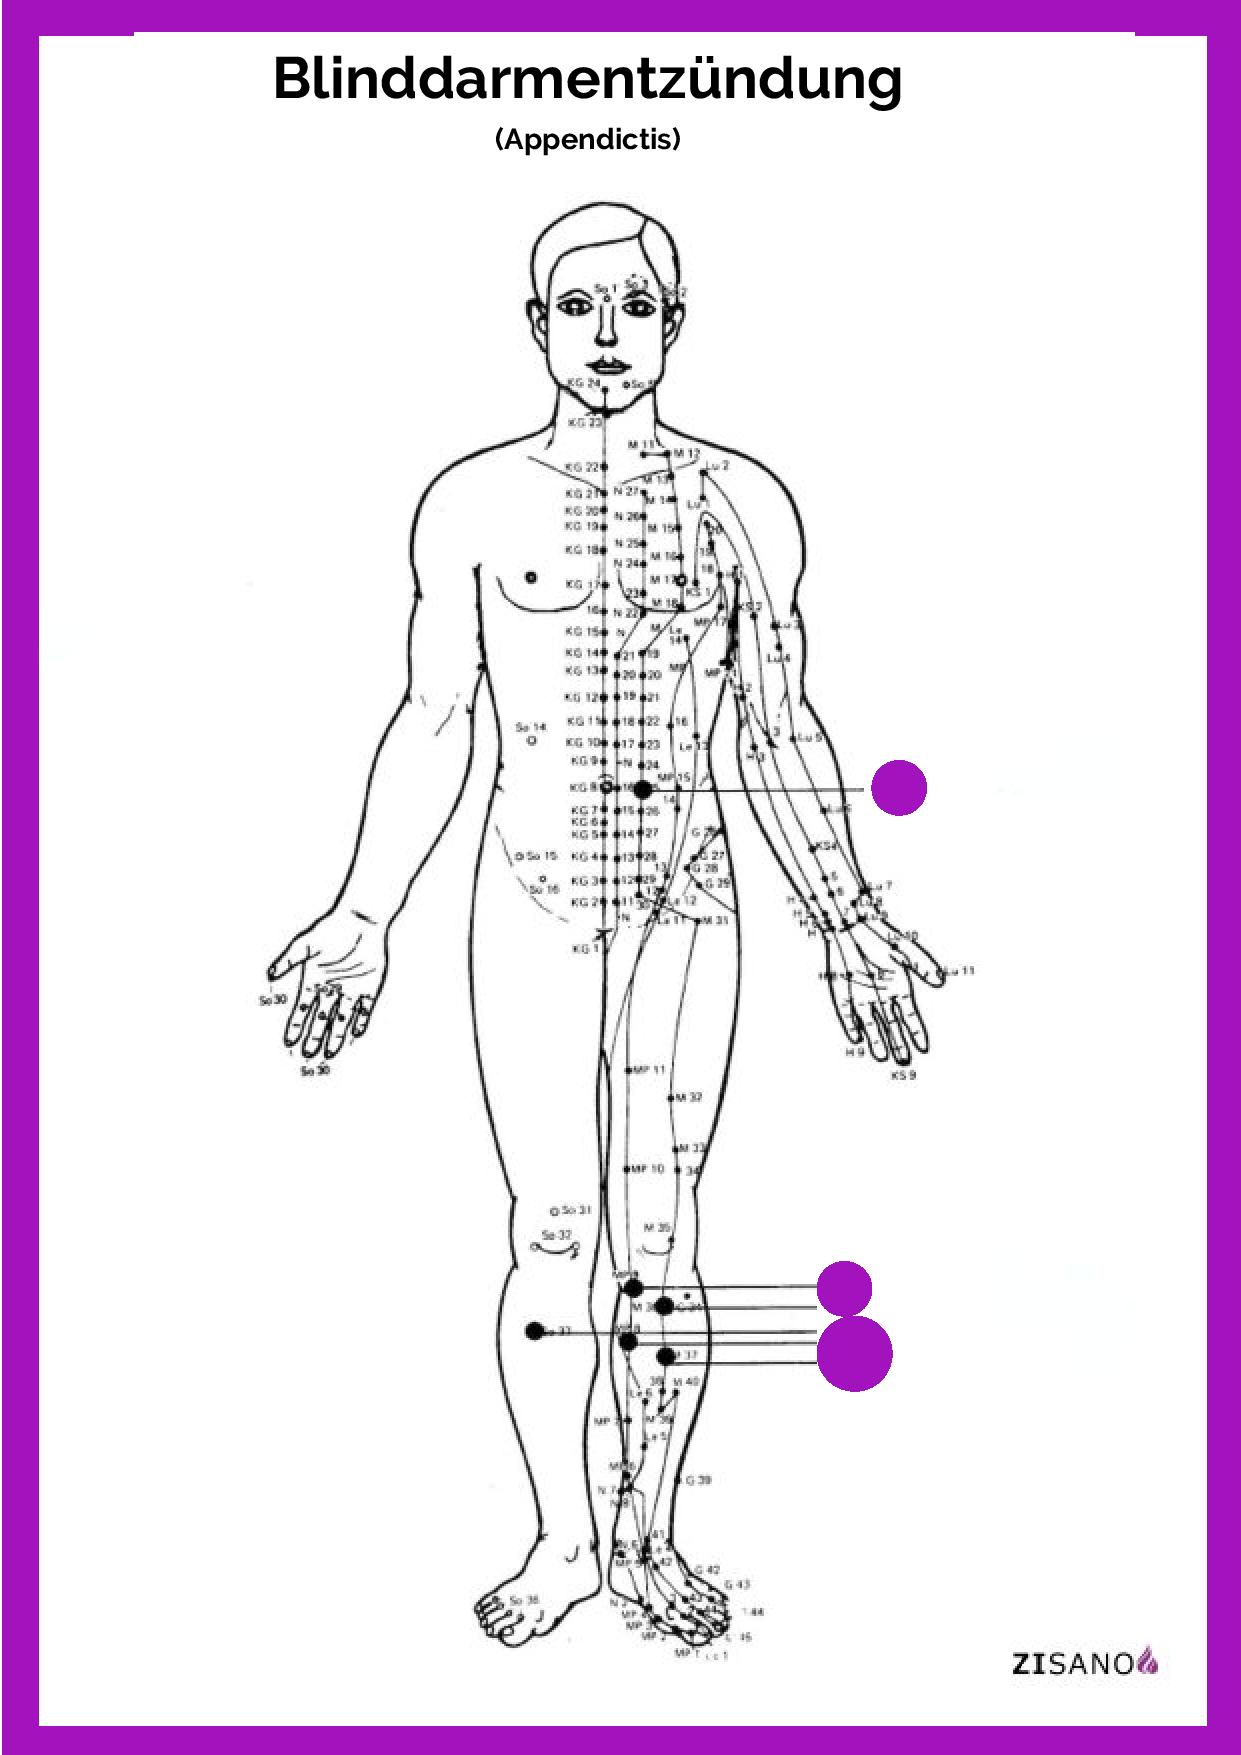 Meridiane - Blinddarmentzündung (Appendictis) - Schmerzlinderung